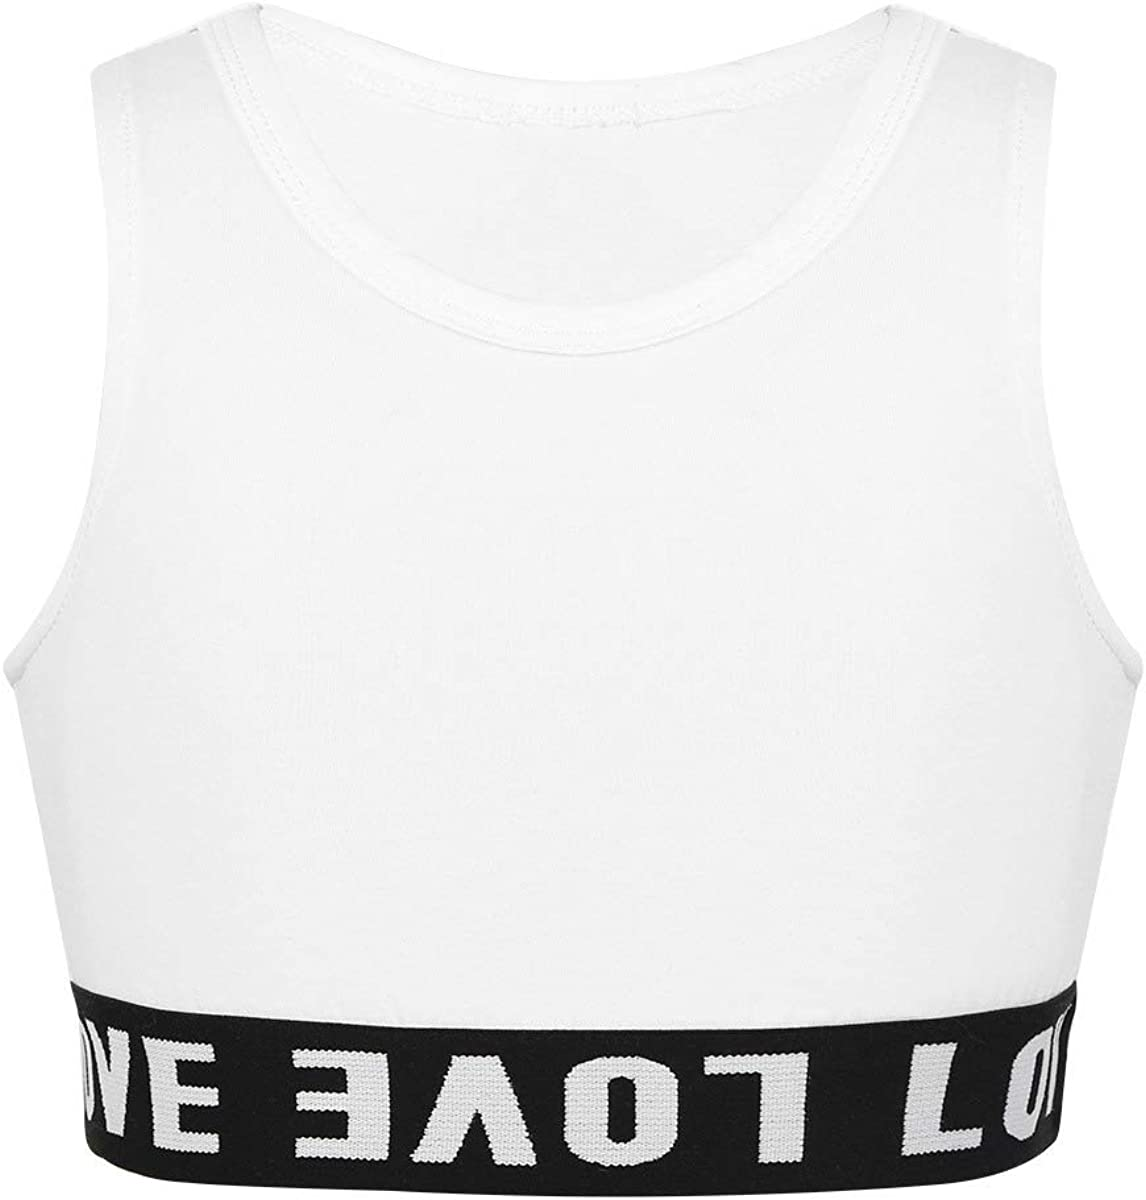 Yeeye Kids Girls' Letter Printed Sports Bra Crop Top Sleeveless Yoga Dance Athletic Tank Top Shirts